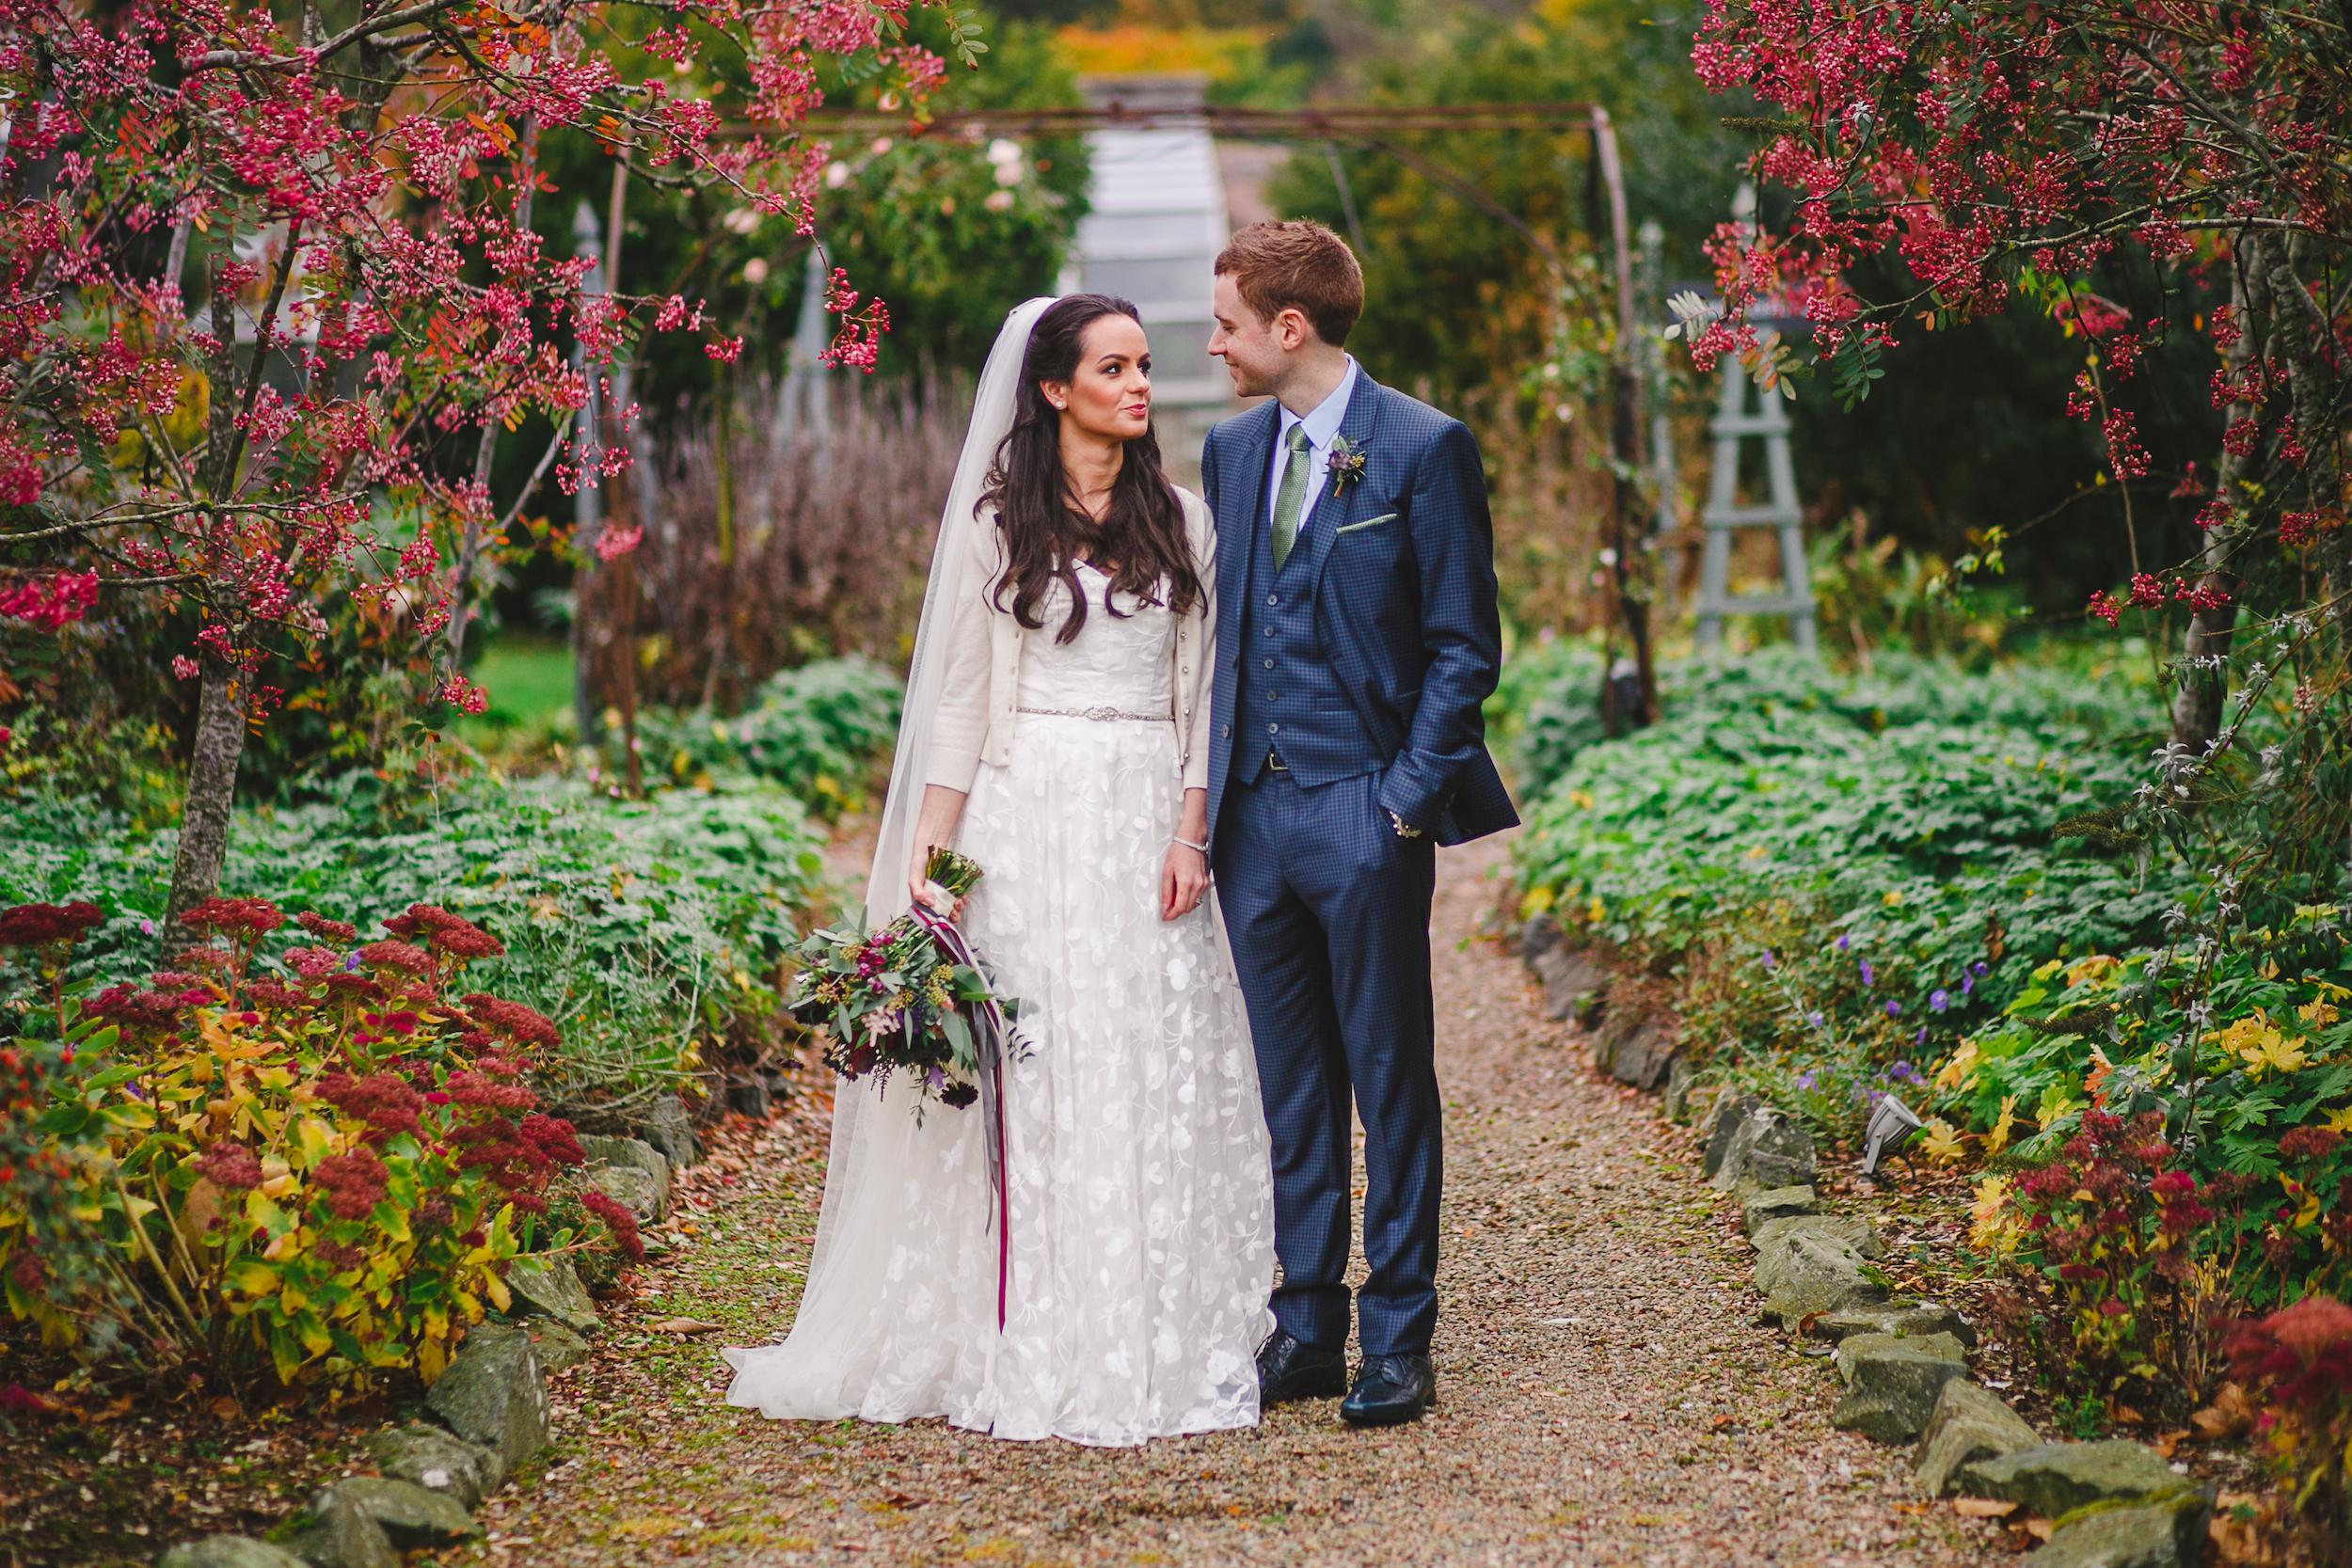 gather_and_tides_wedding_photographer_larchfield_autumn_northern_ireland_Wedding_inspire_Weddings_8.jpg